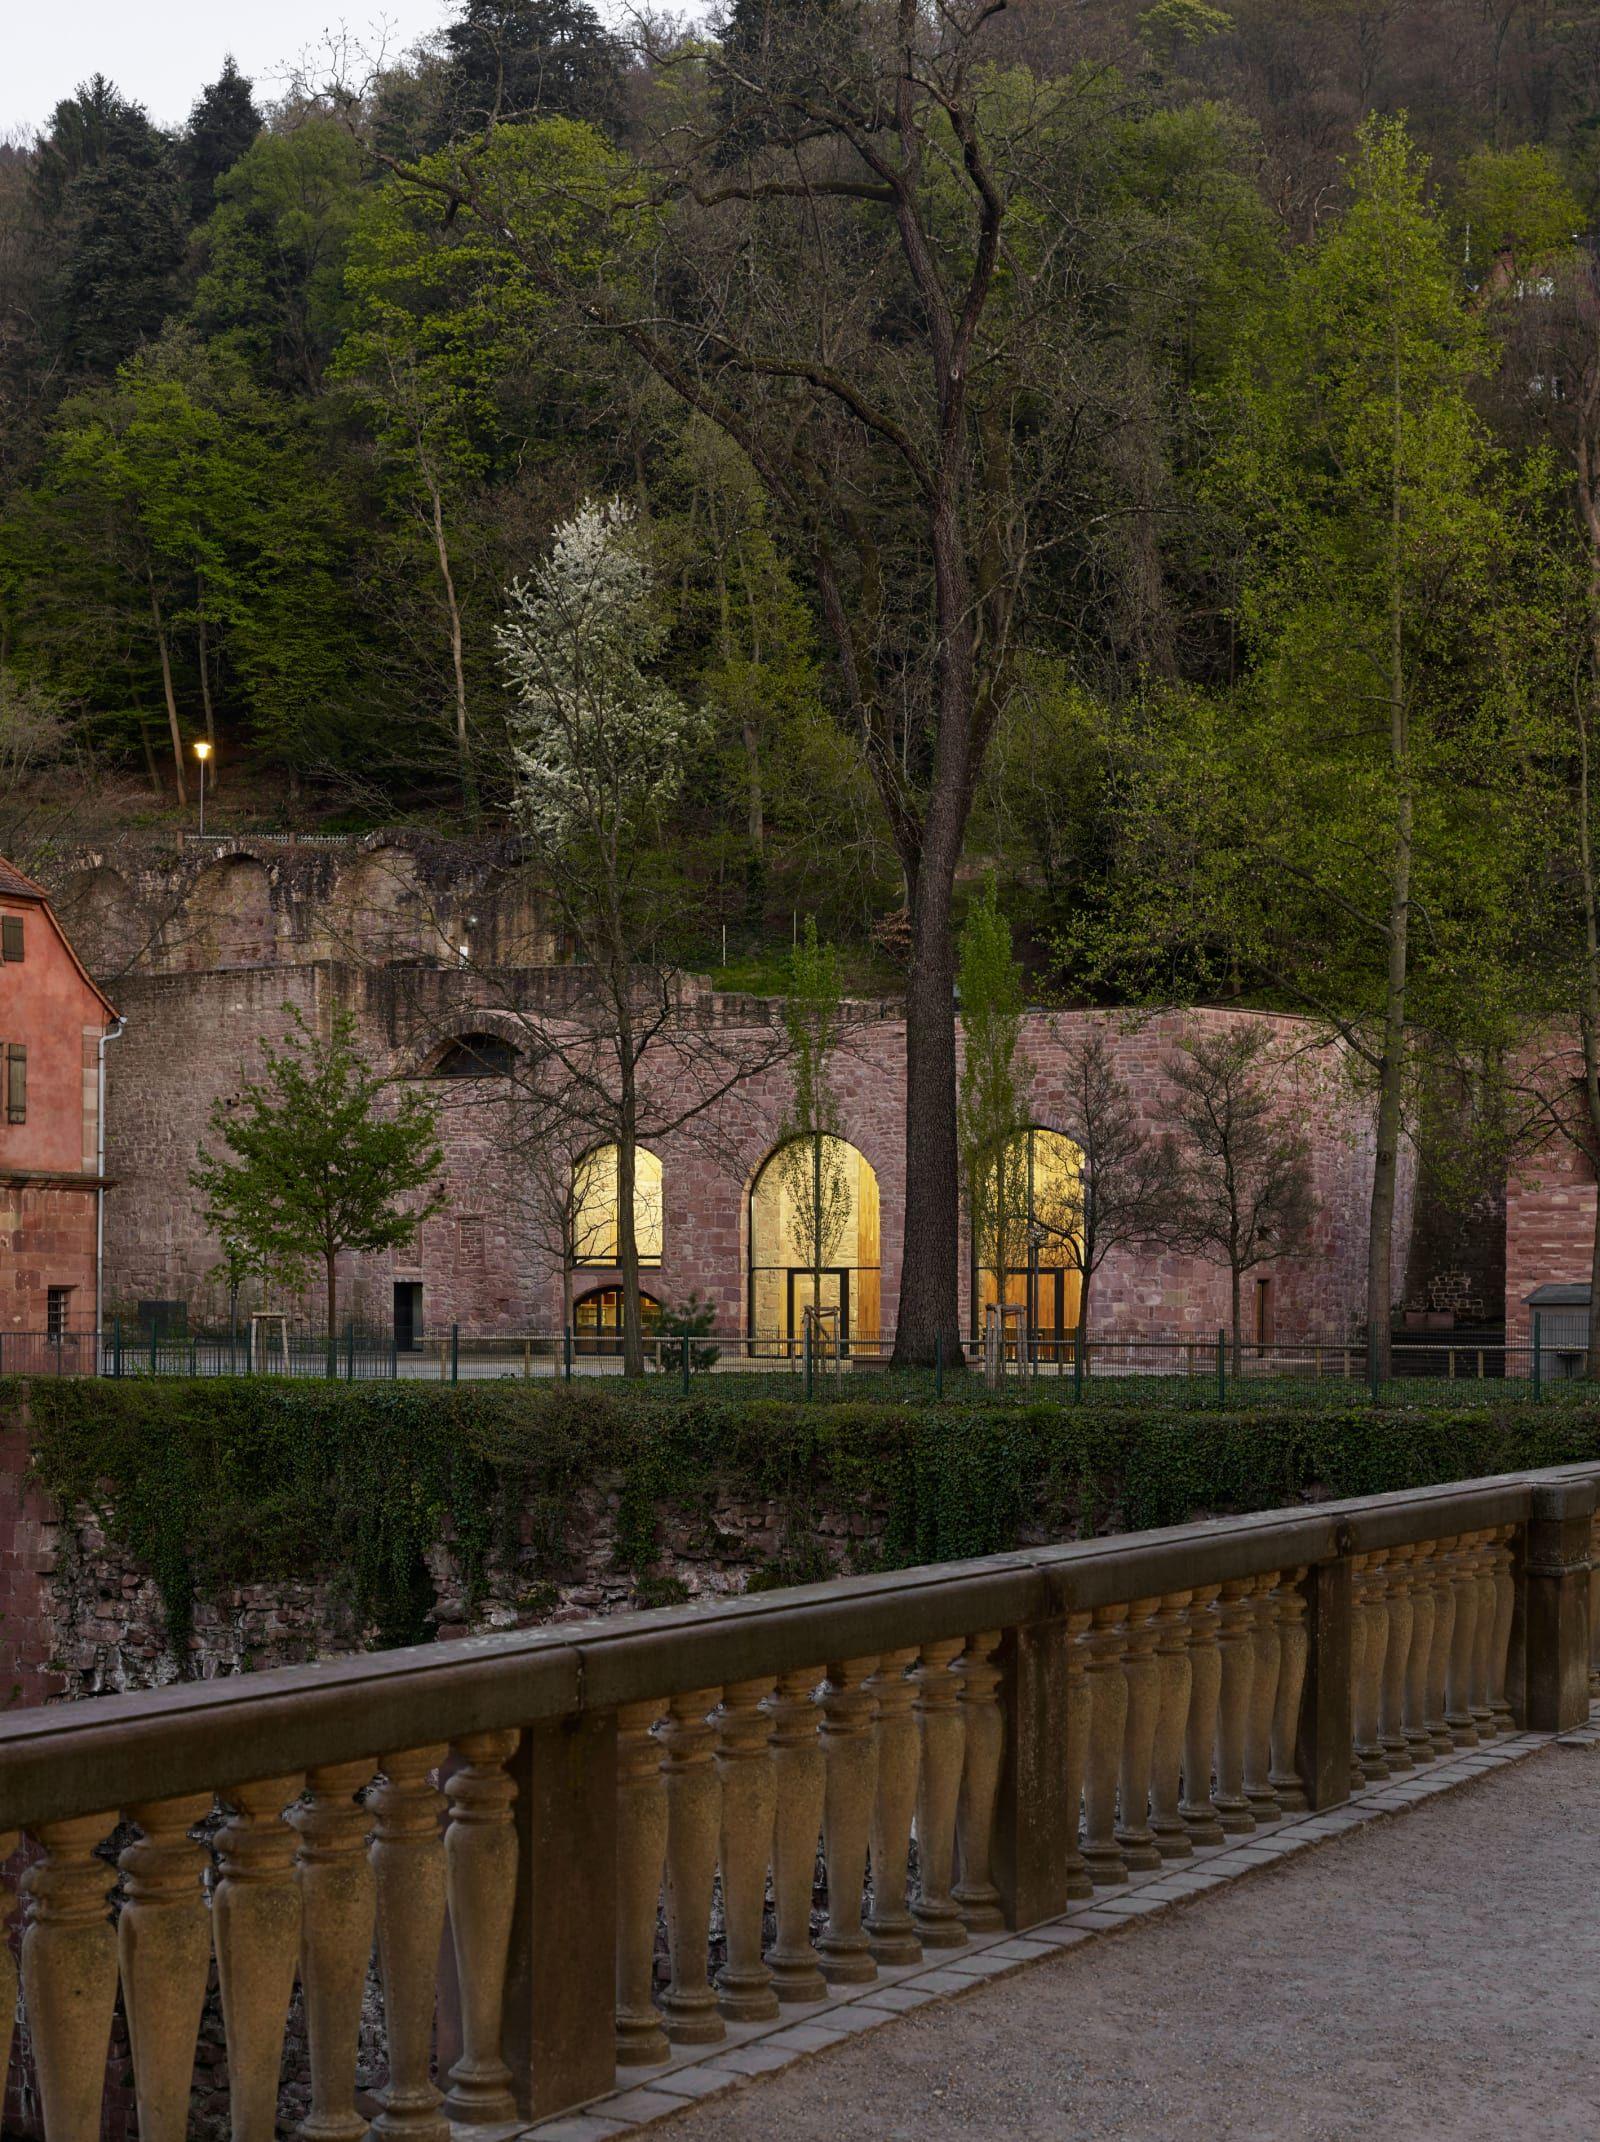 Architekt Heidelberg max dudler architekt stefan müller heidelberg castle b